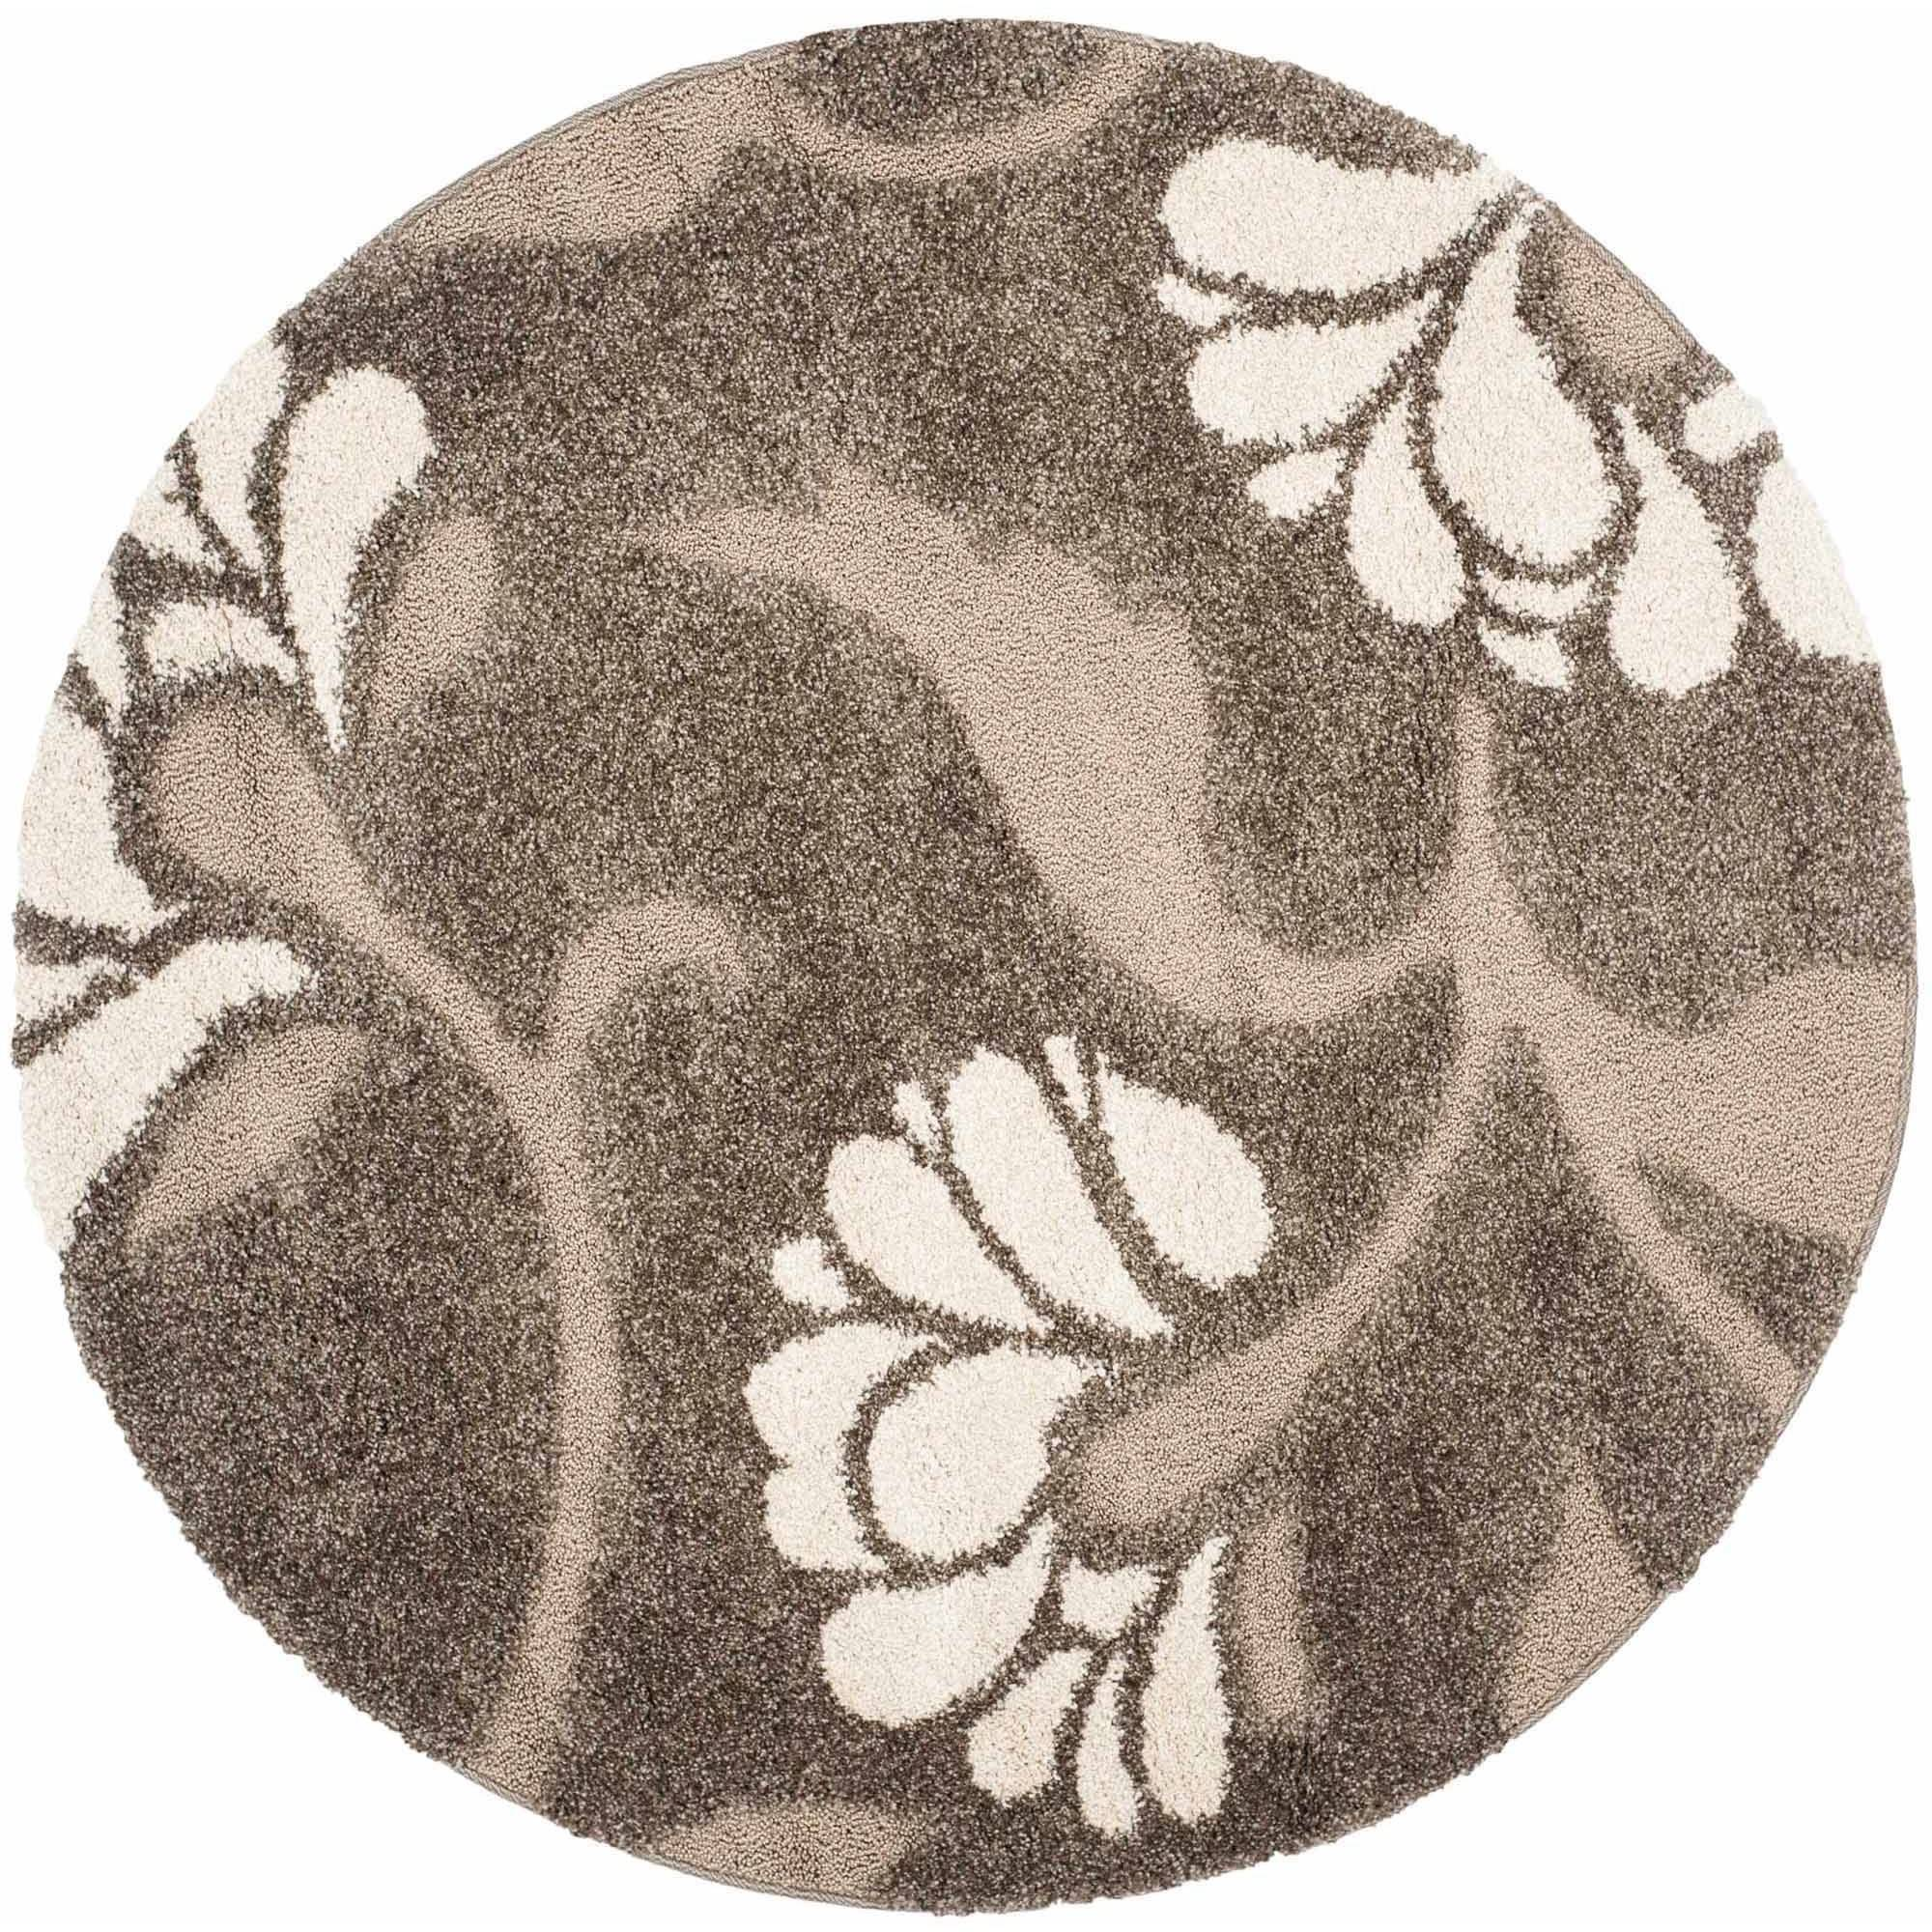 Safavieh Florida Teodor Floral Shag Area Rug or Runner by Safavieh